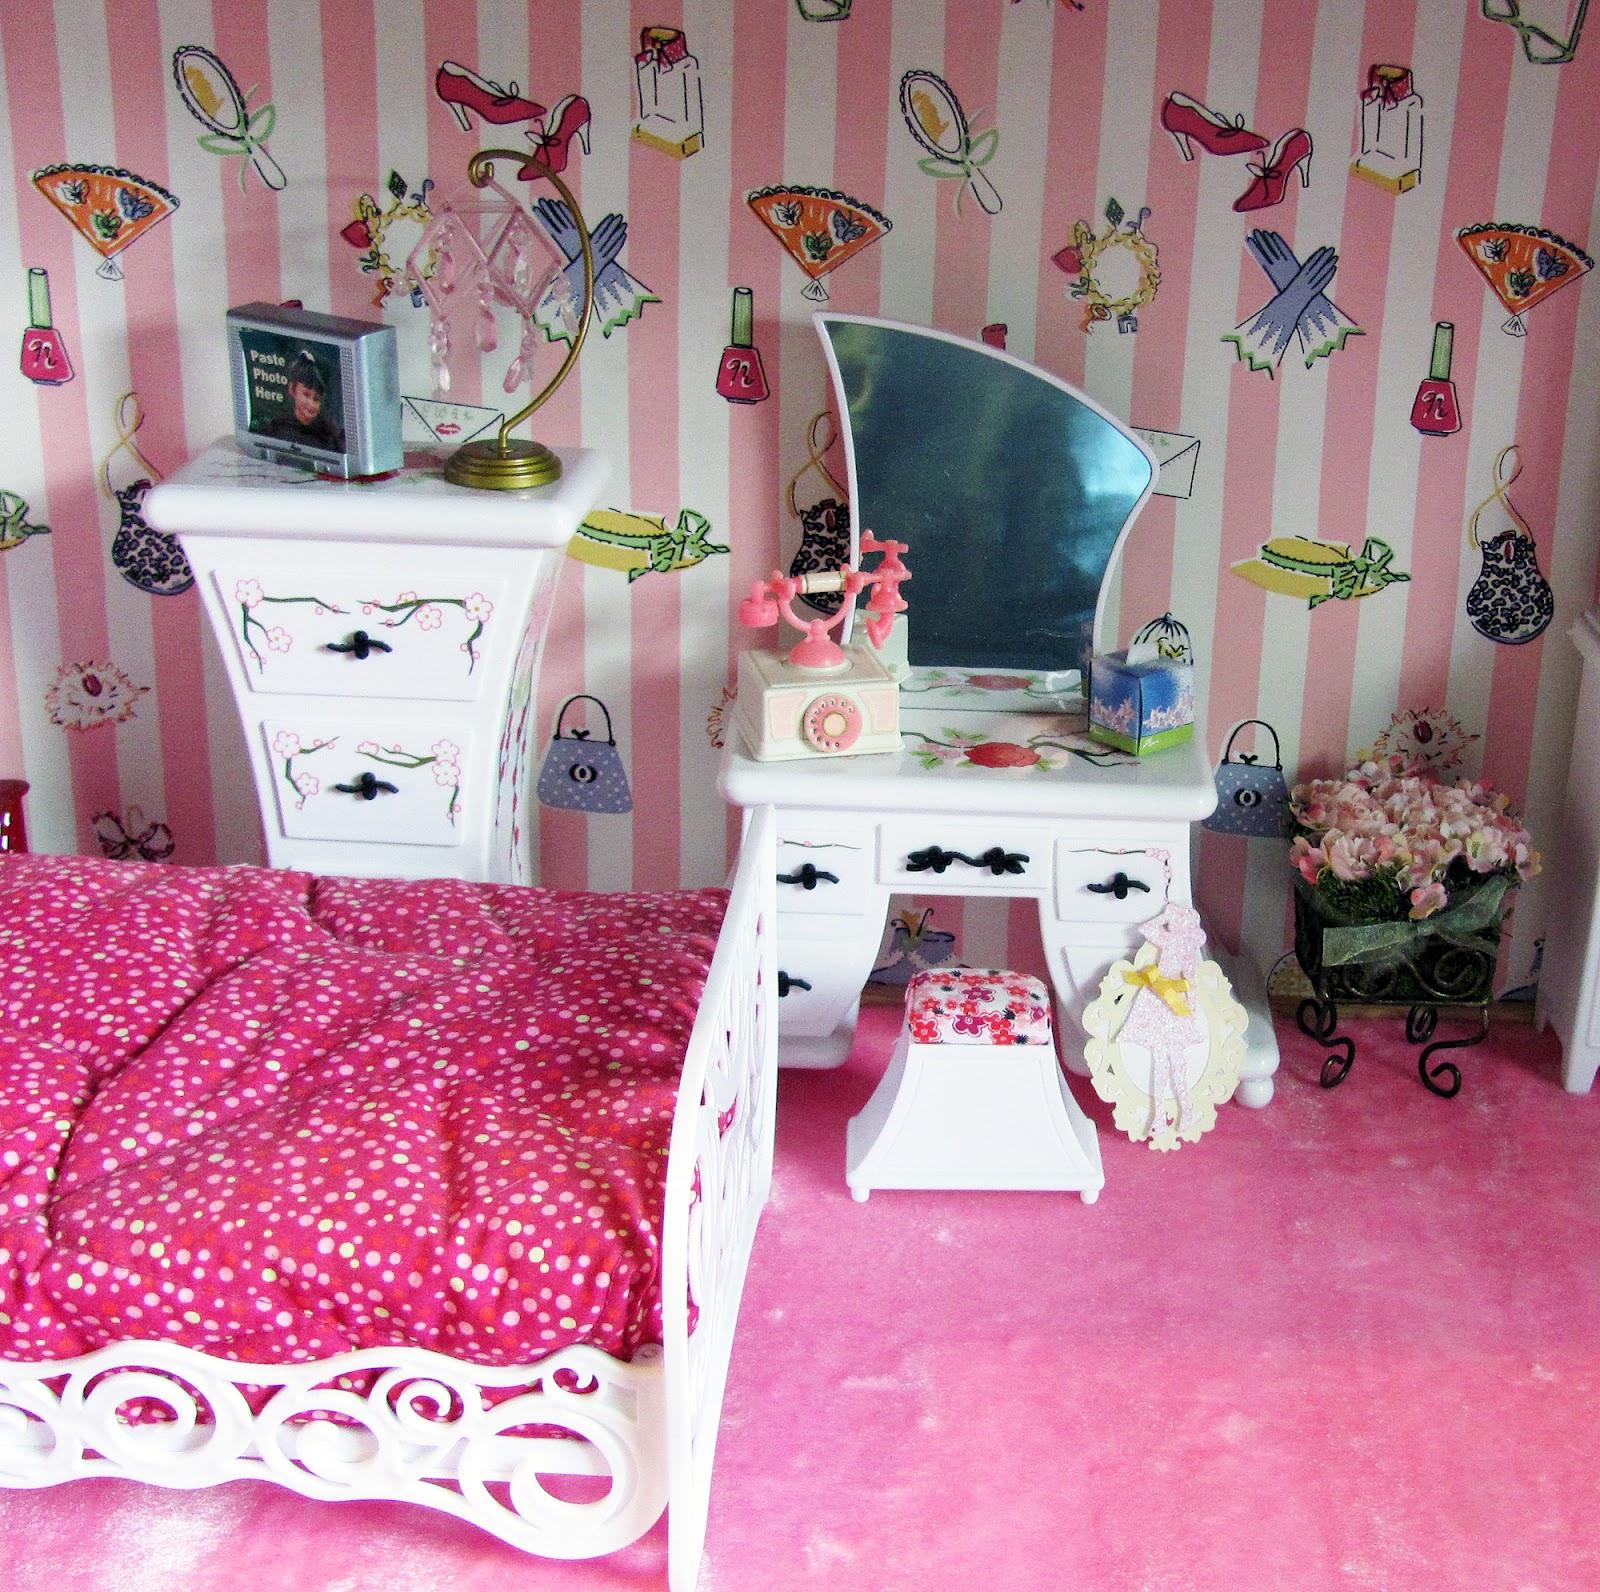 Chrissy S Creative Corner Barbieville Doll House Progress